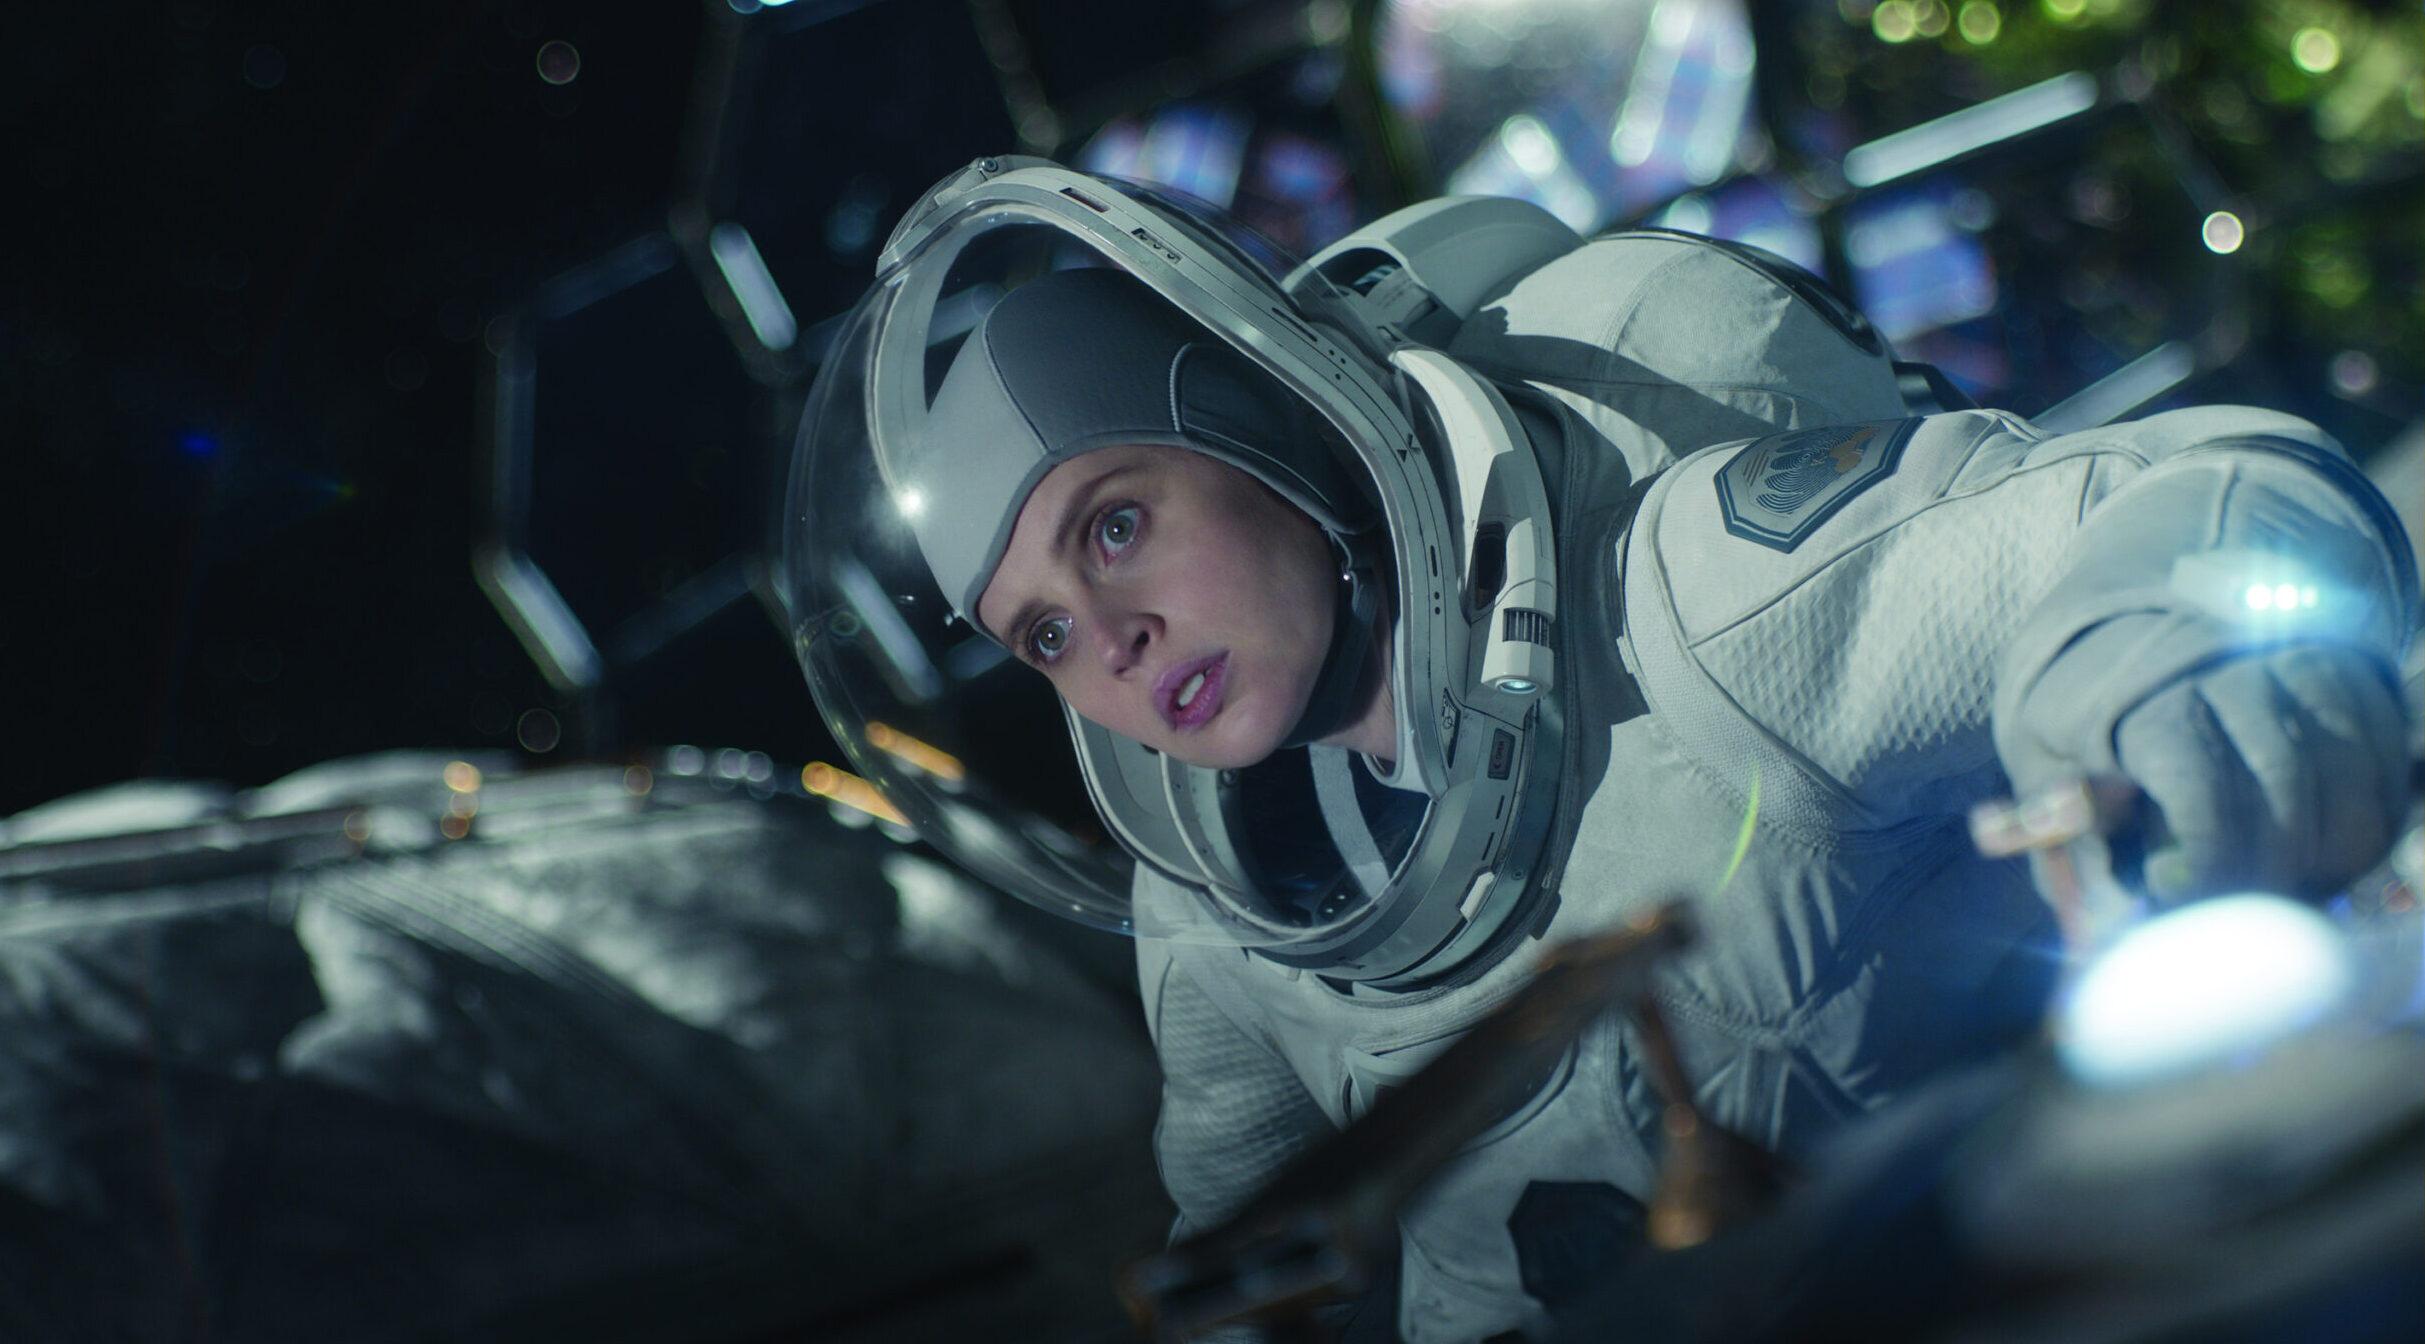 George Clooney e David Fincher, in arrivo su Netflix i nuovi film